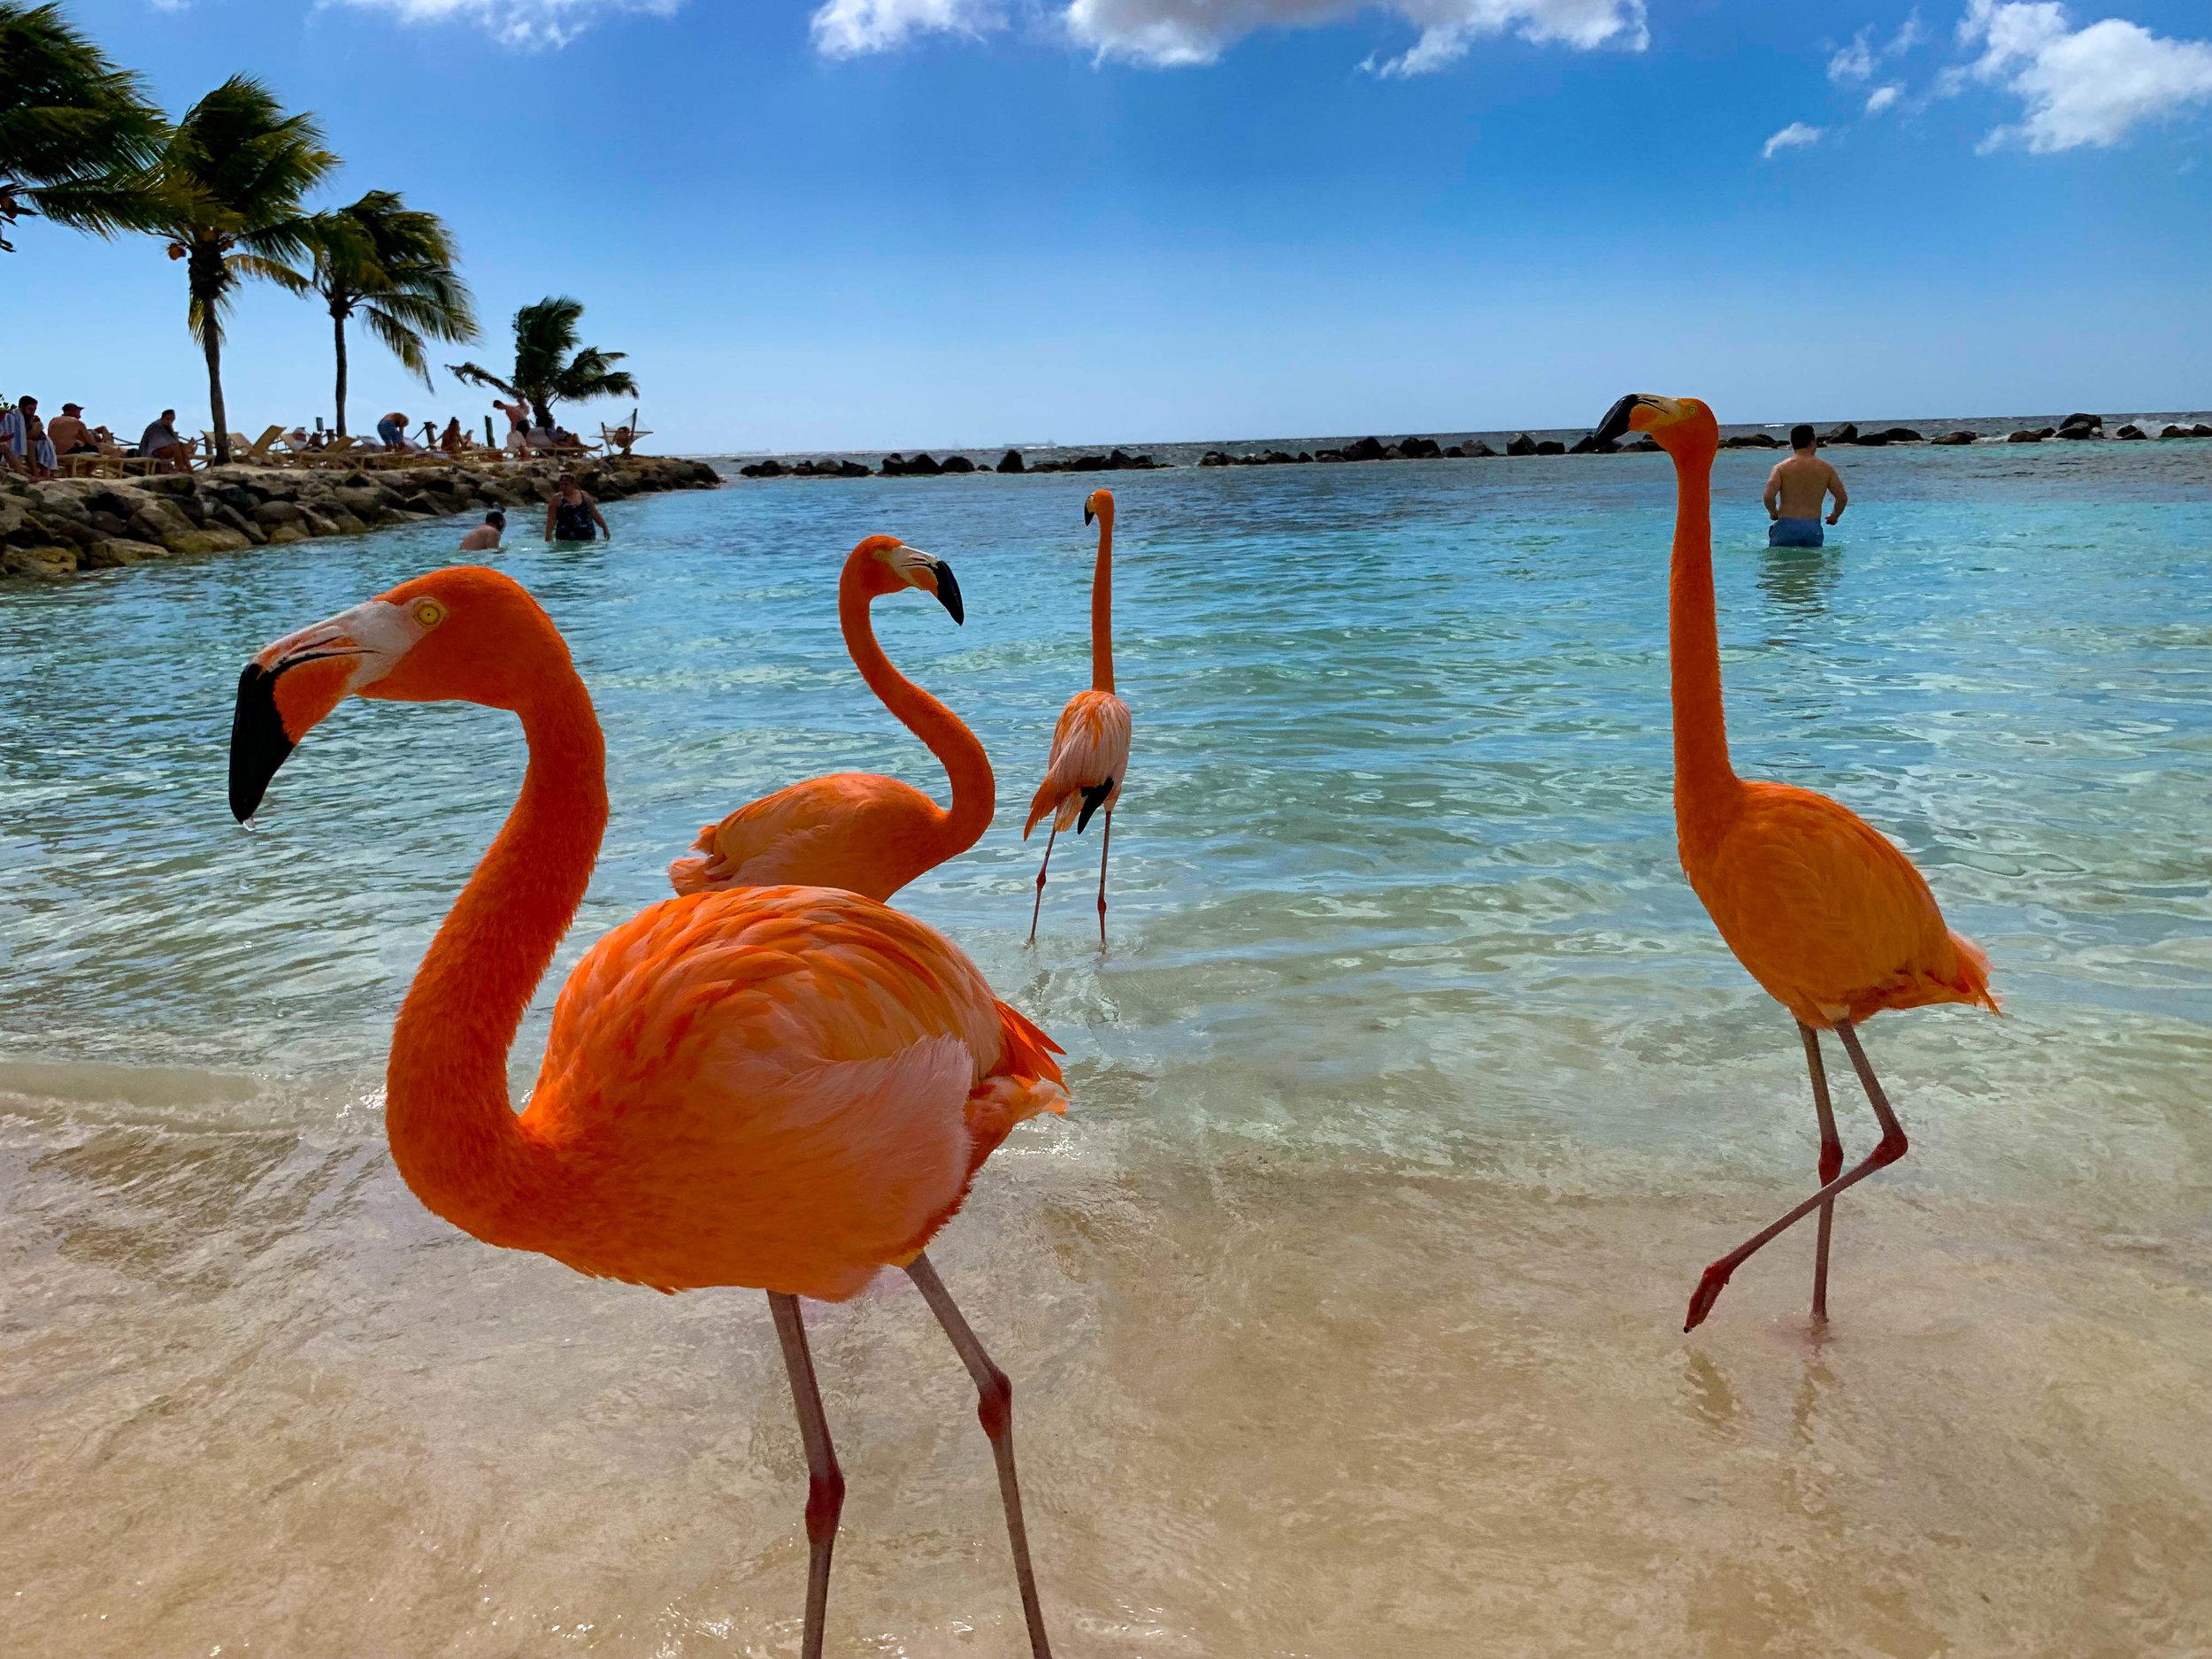 Aruba-Flamingo-Renaissance_Island-11.jpg